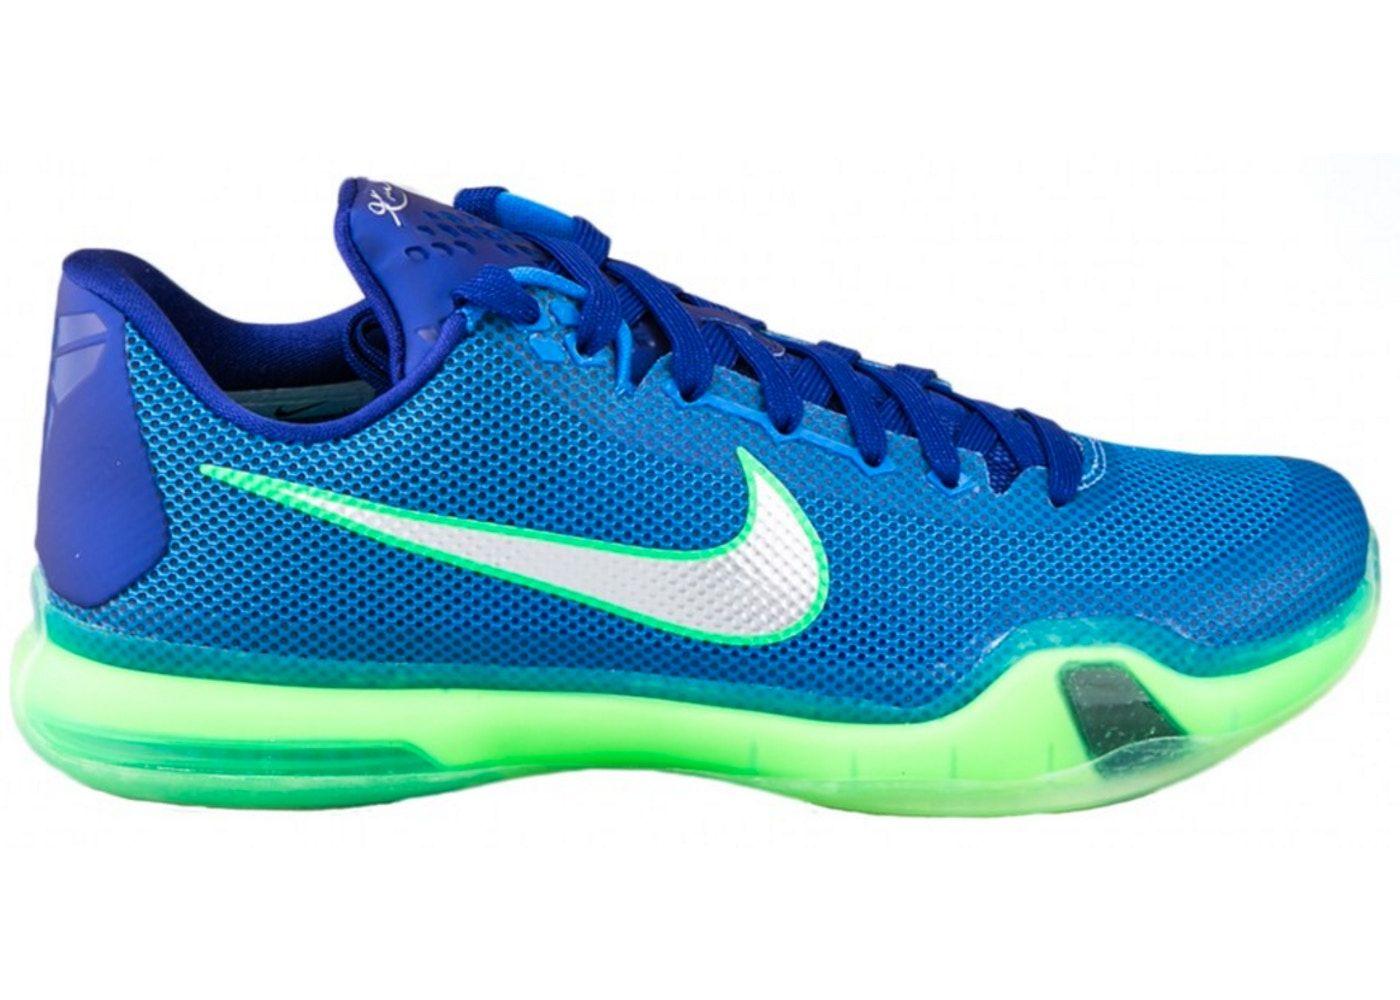 Nike Kobe 10 Emerald City | Kobe 10